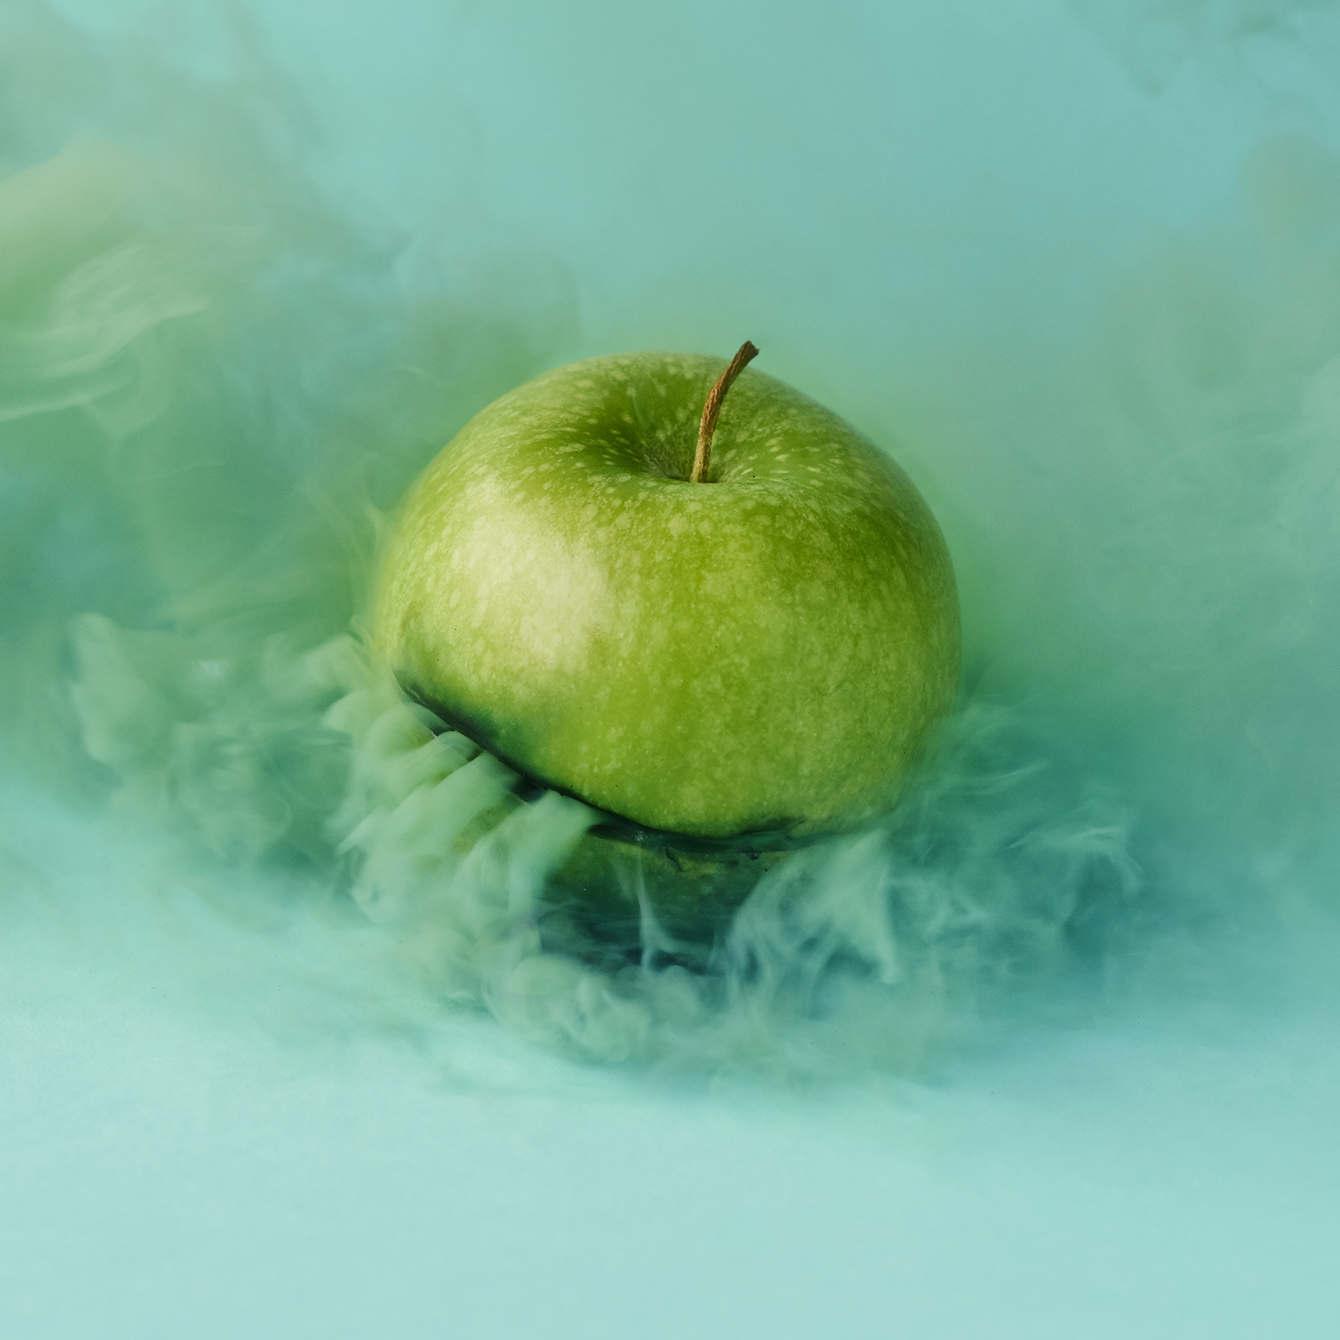 03-granny_smith_apple_1340_c.jpg